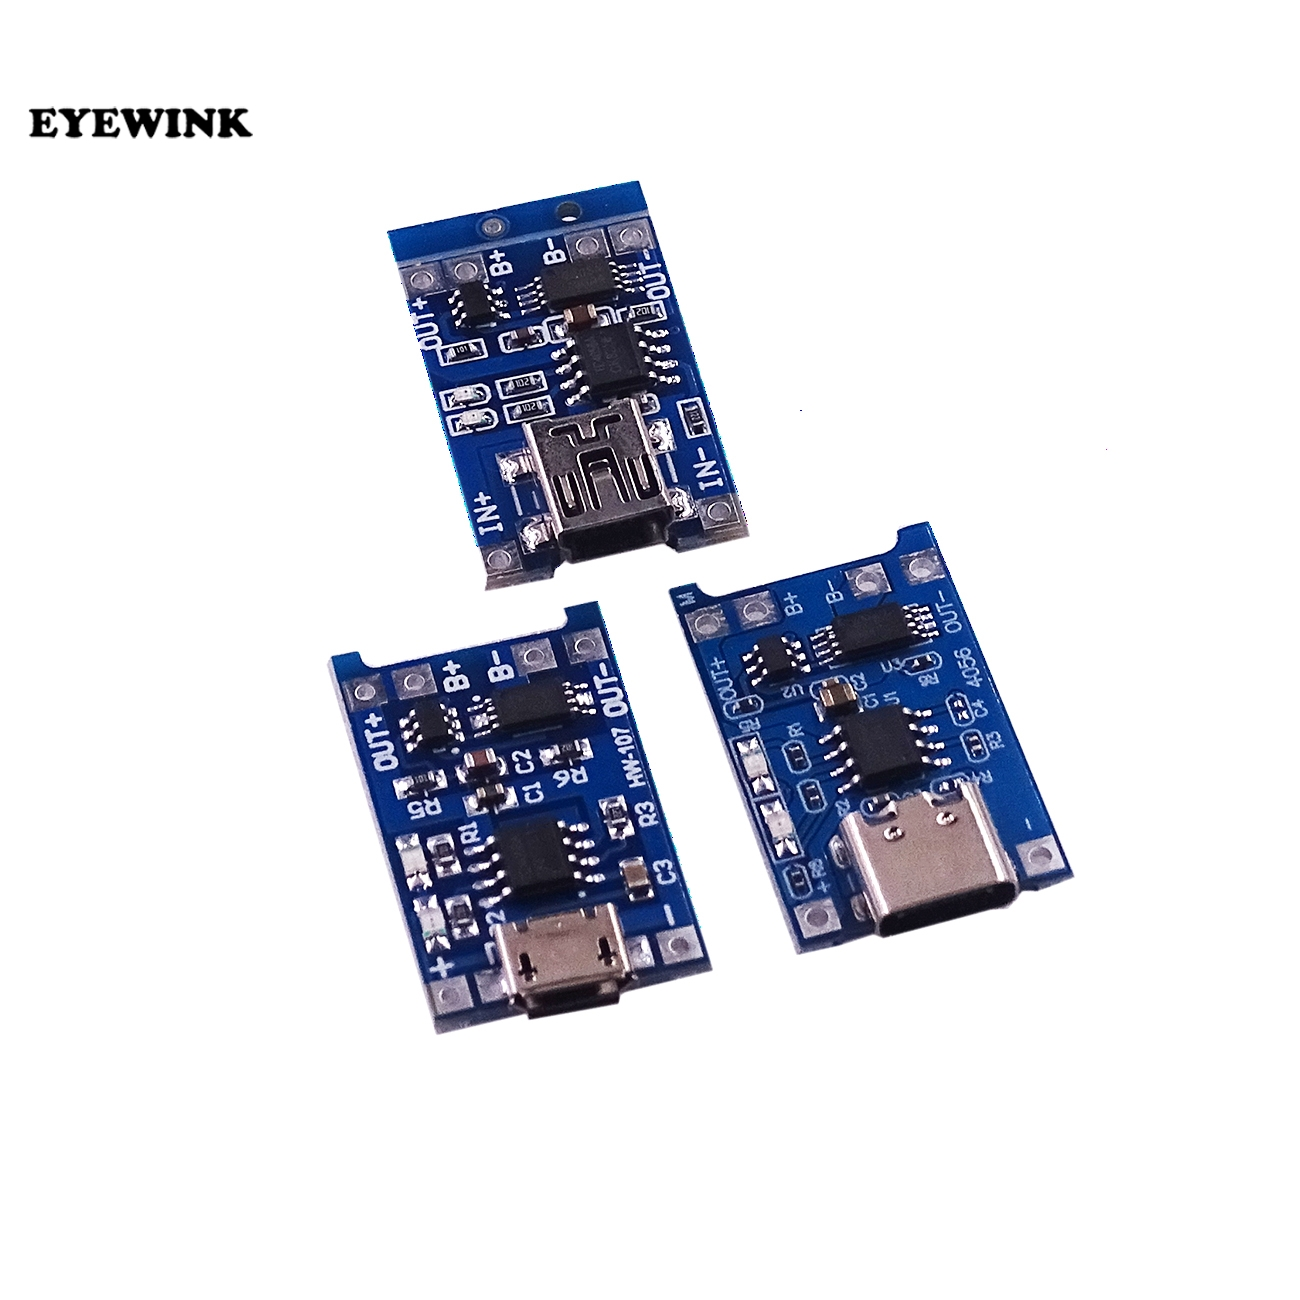 1PCS TP4056 TC4056 Type-c/Micro/Mini USB 5V 1A 18650 Lithium Battery Charger Module Charging Board Dual Functions Li-ion